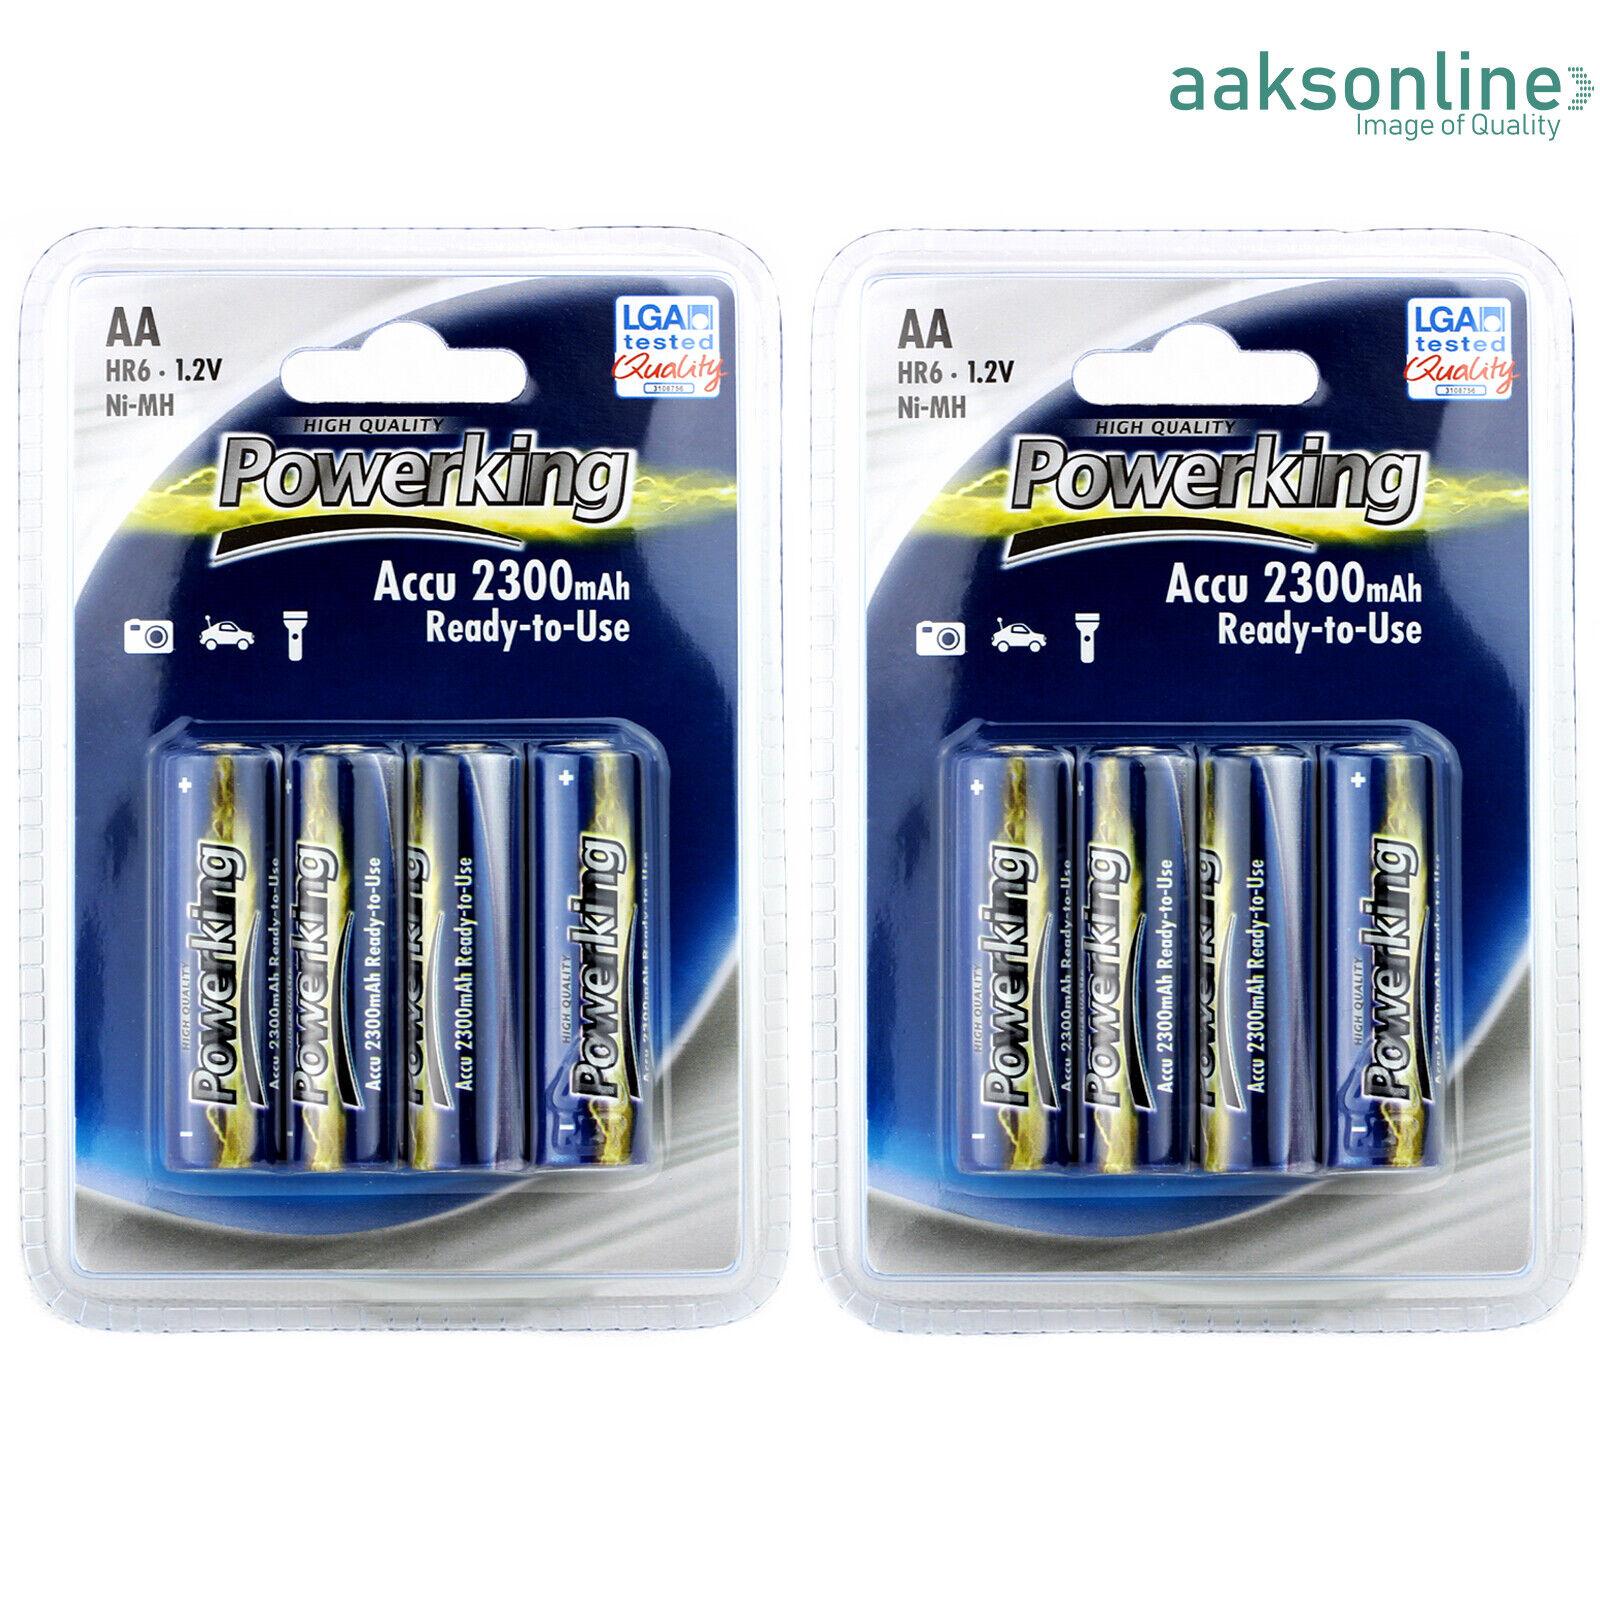 8x AA 2300 mAh AKKU NI-MH Wiederaufladbar Accu Rechargeable Batterien Mignon TOP